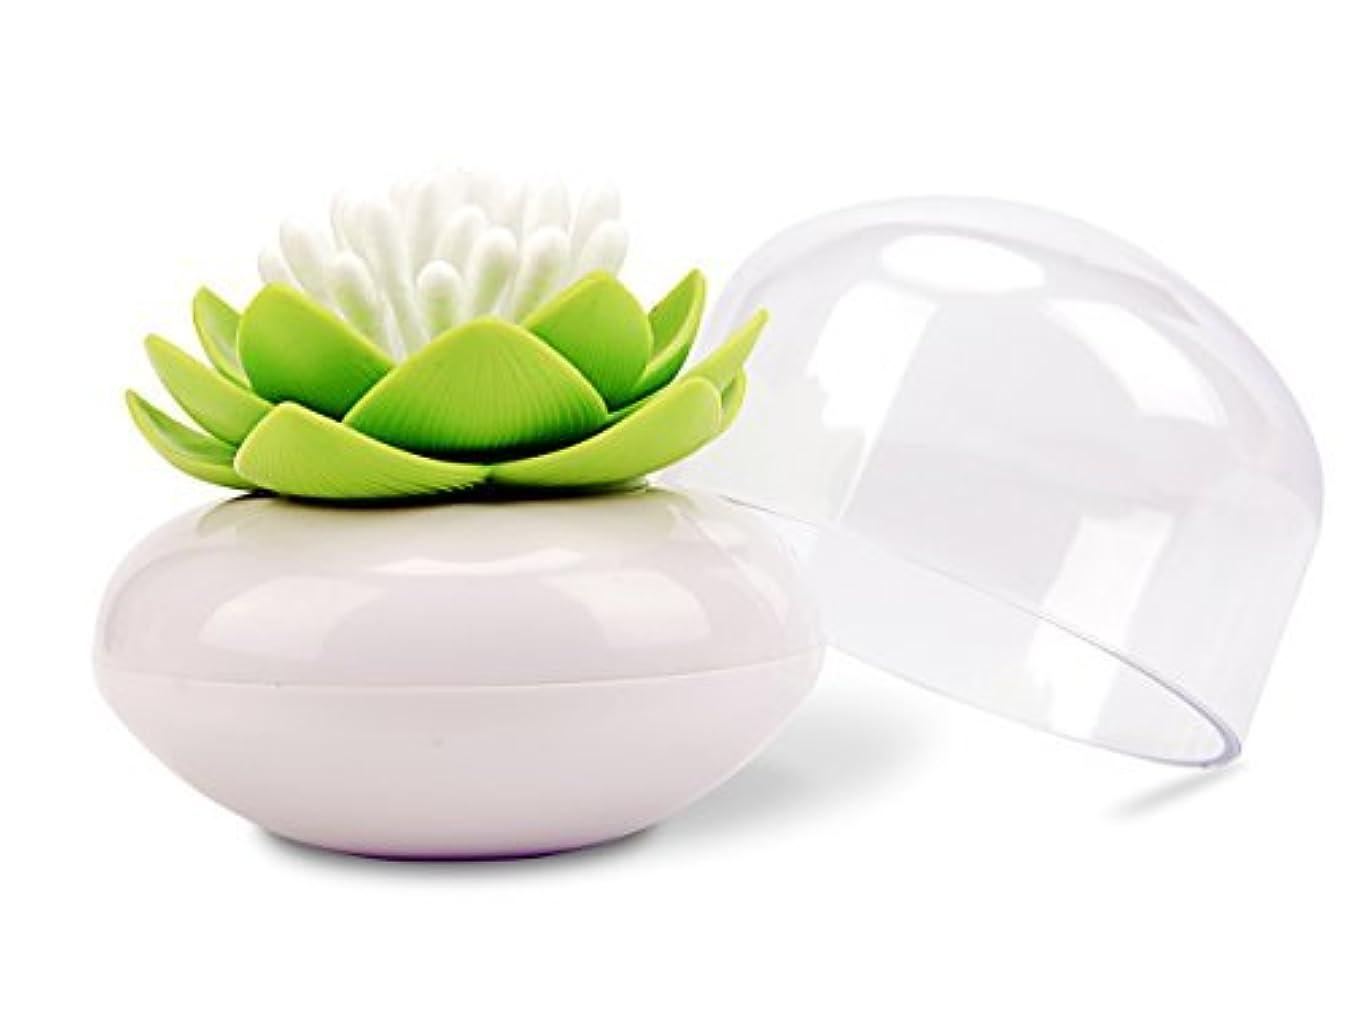 Bloss Q-Tips Holder Cotton Ball/Swab Organizer Lotus Shape Swab Cosmetic Storage&Toothpick Holder, Green